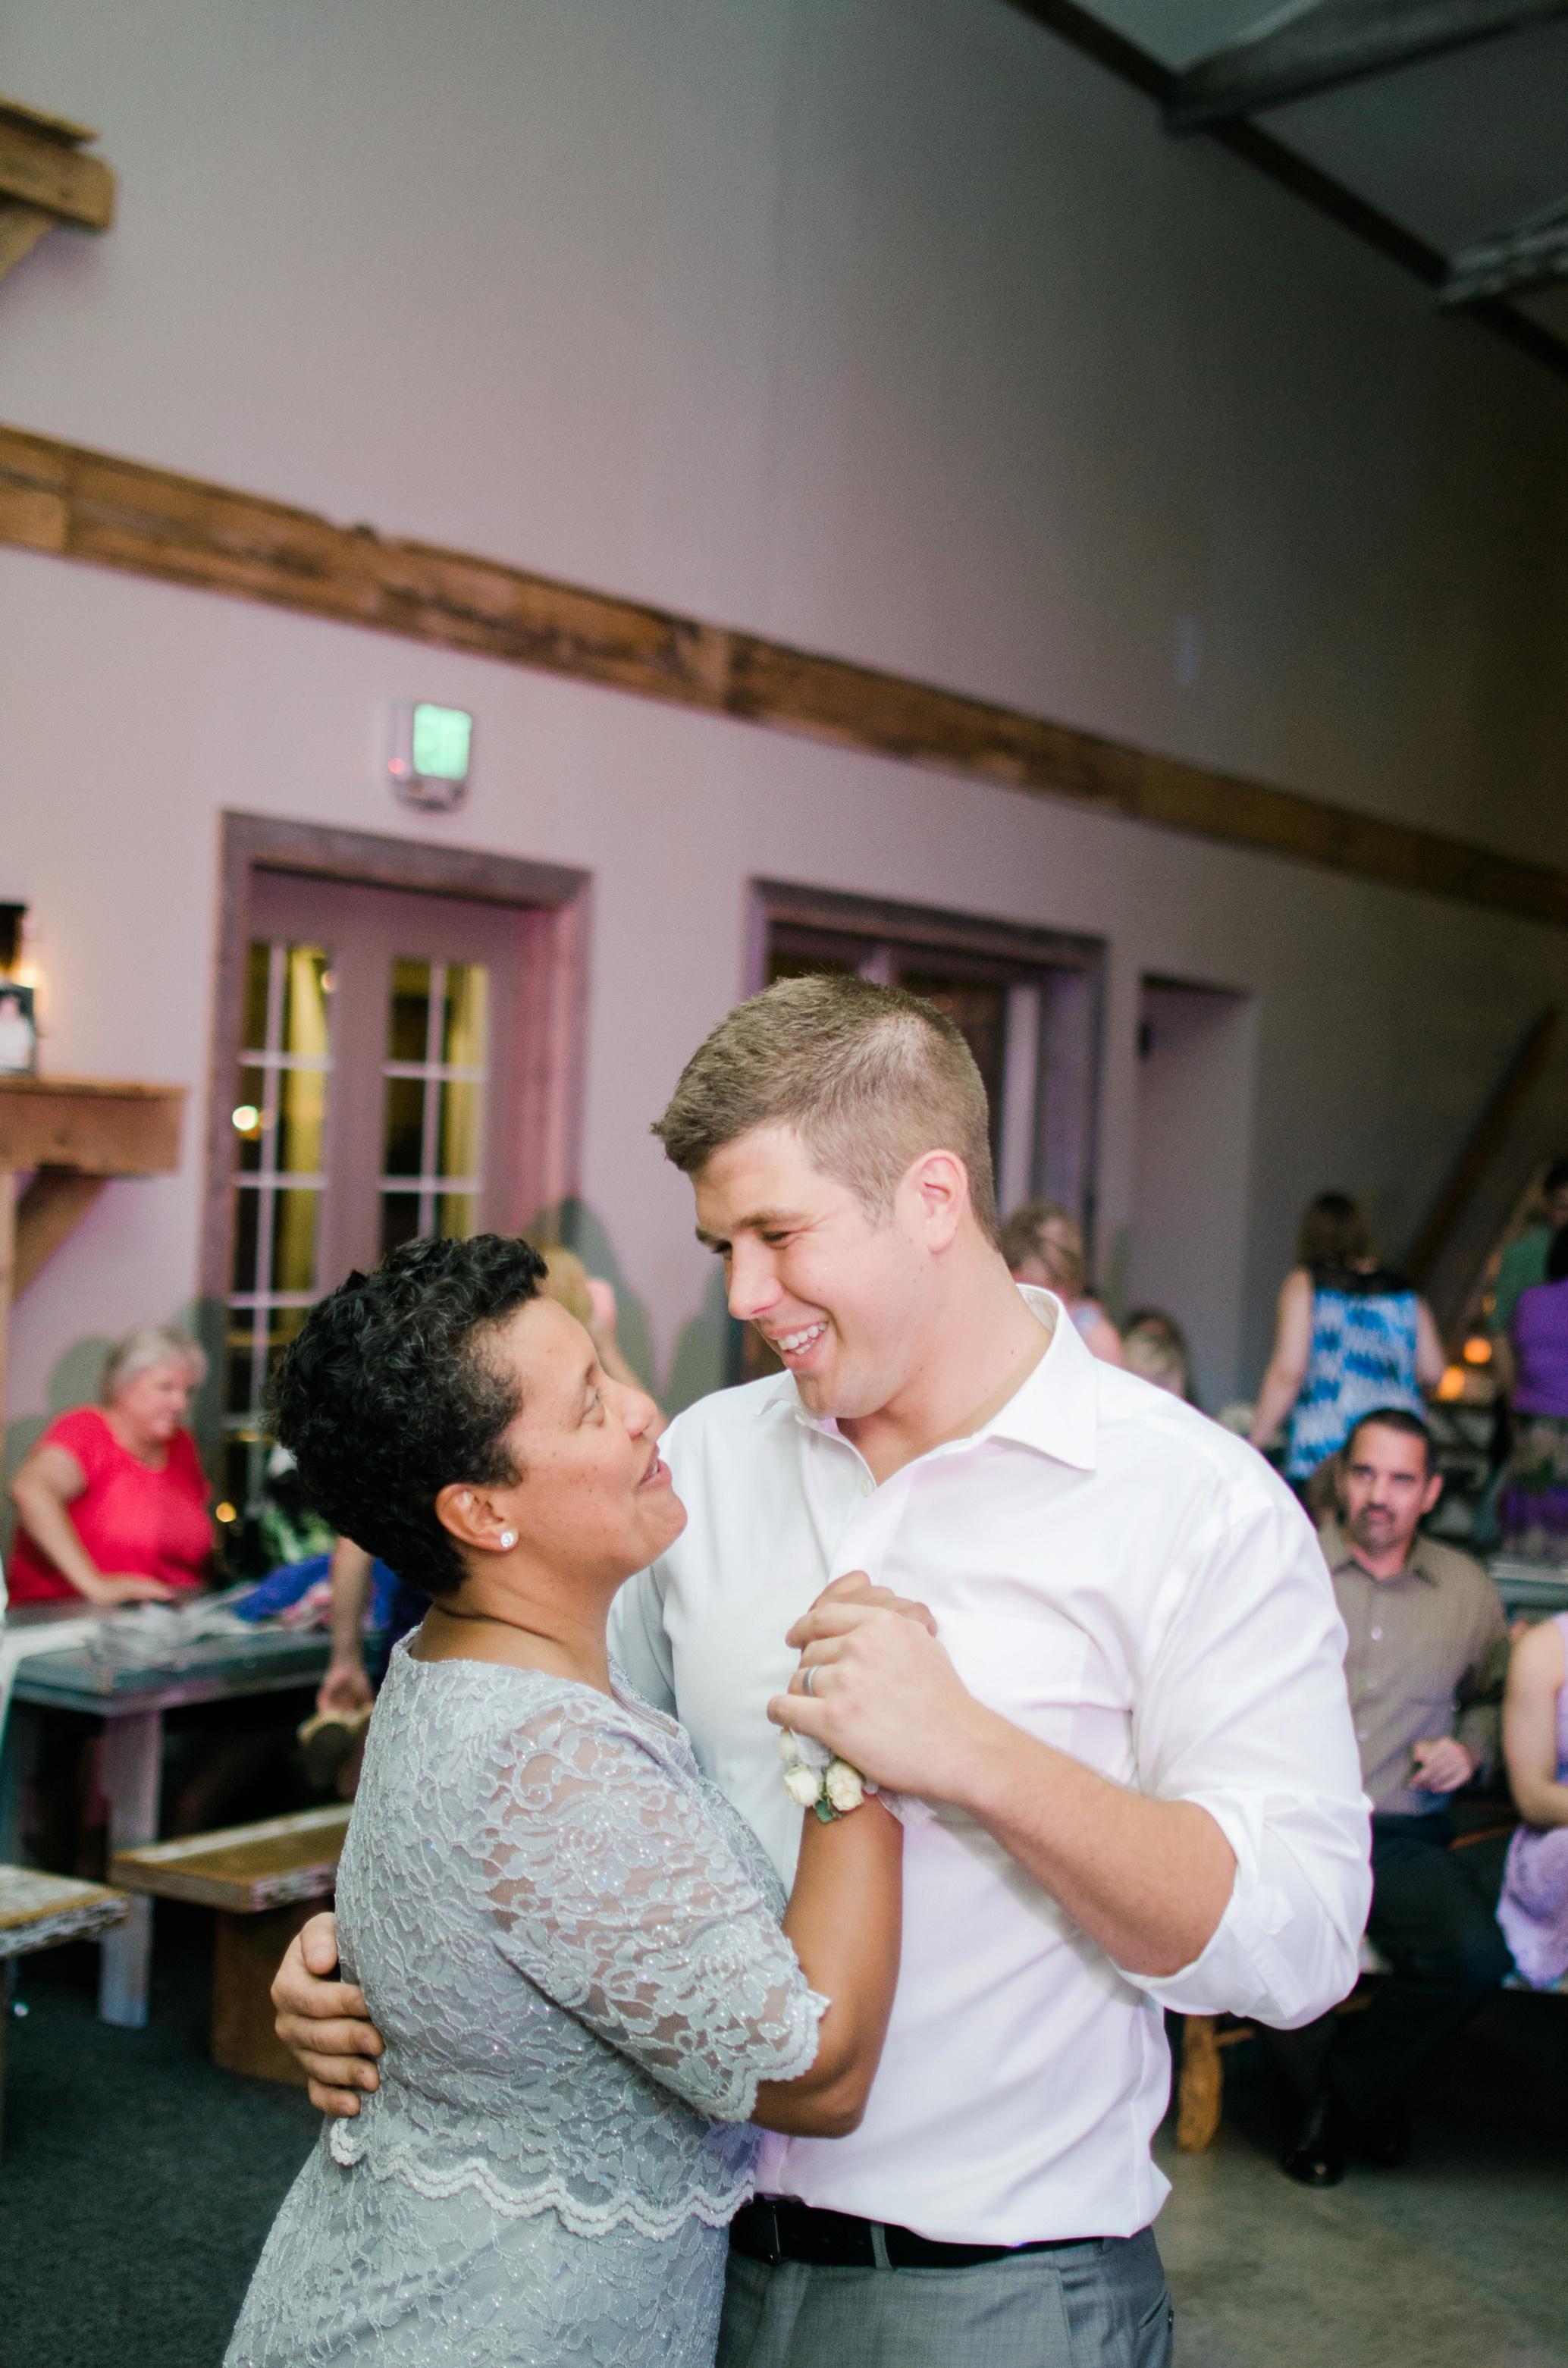 Barnes' Place Rustic Outdoor Wedding | Ali Leigh Photo Minneapolis Wedding Photographer_0186.jpg